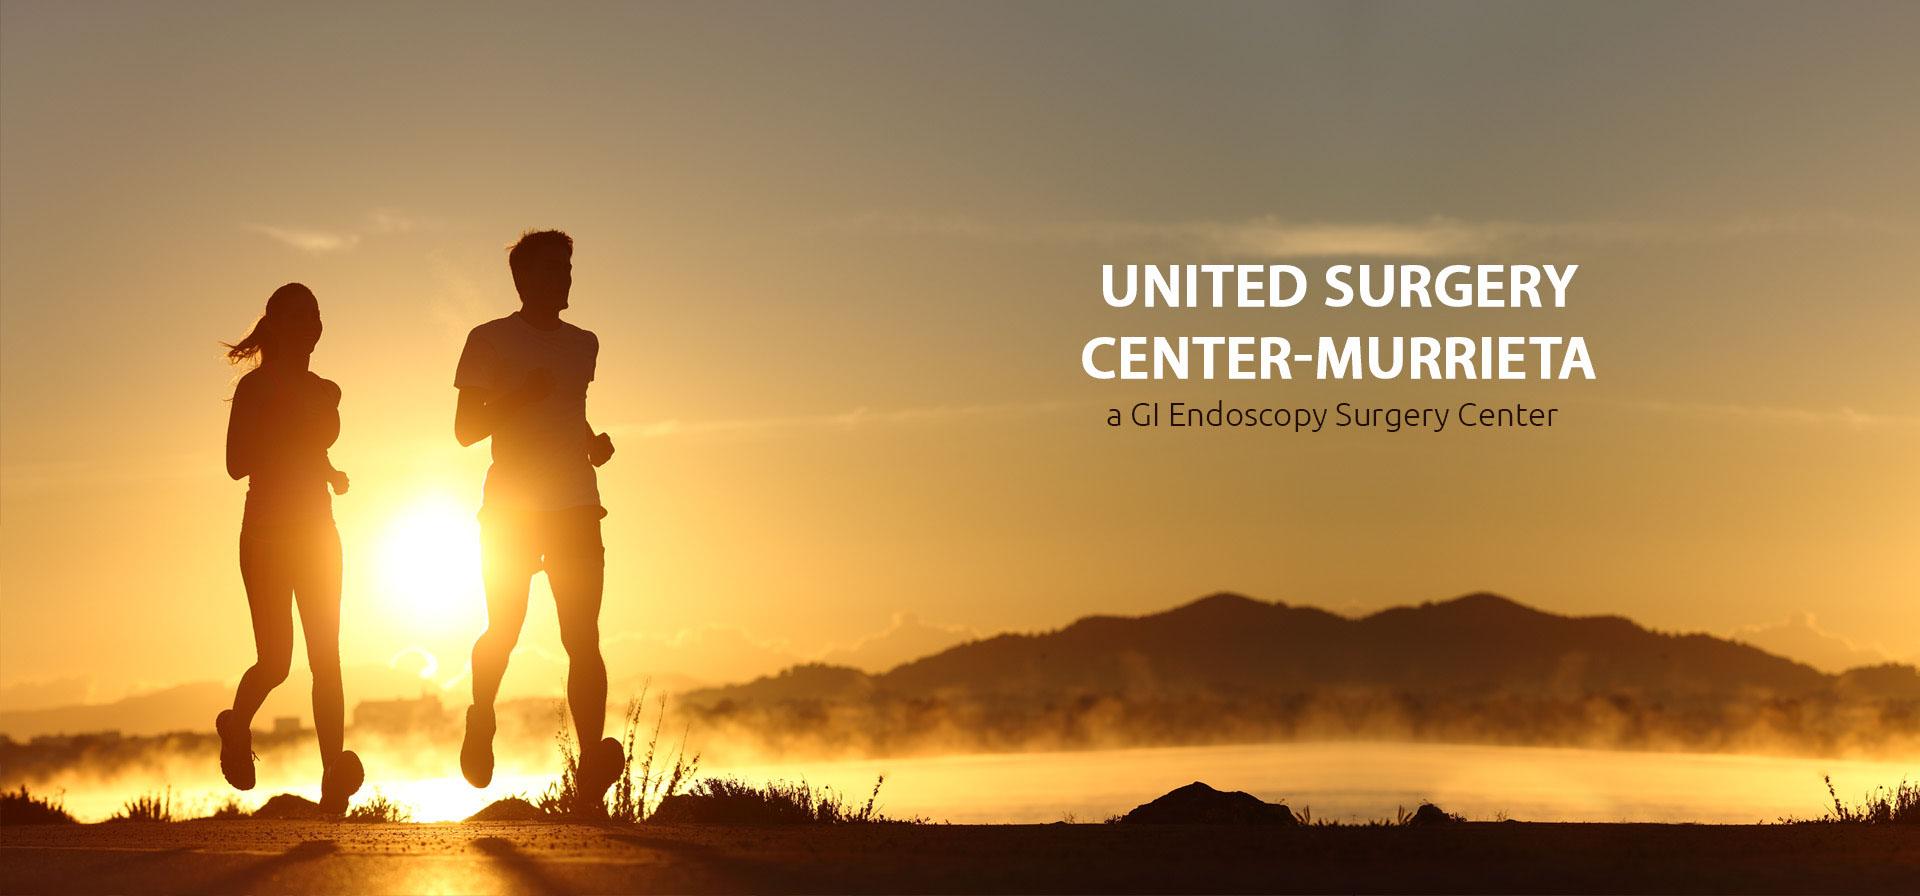 United Surgery Center Temecula Murrieta Obalon Orbera Weight Loss